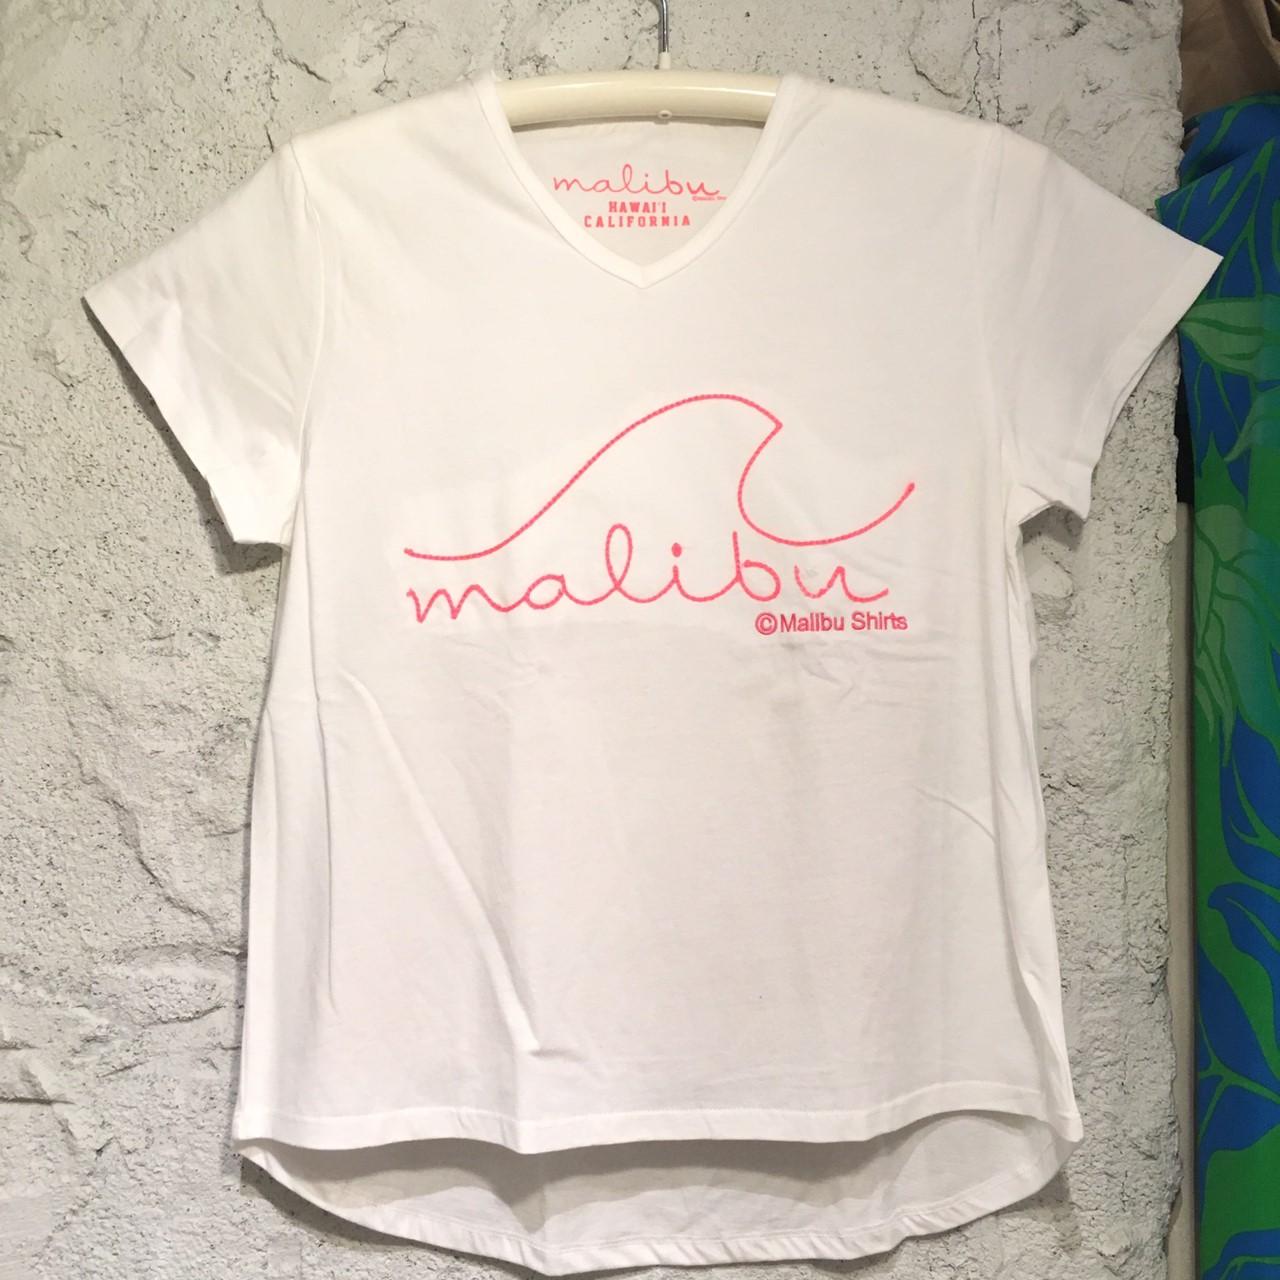 MALIBU SHIRTSチェーン刺繍VネックSSTシャツPK【アロハラバーズ】